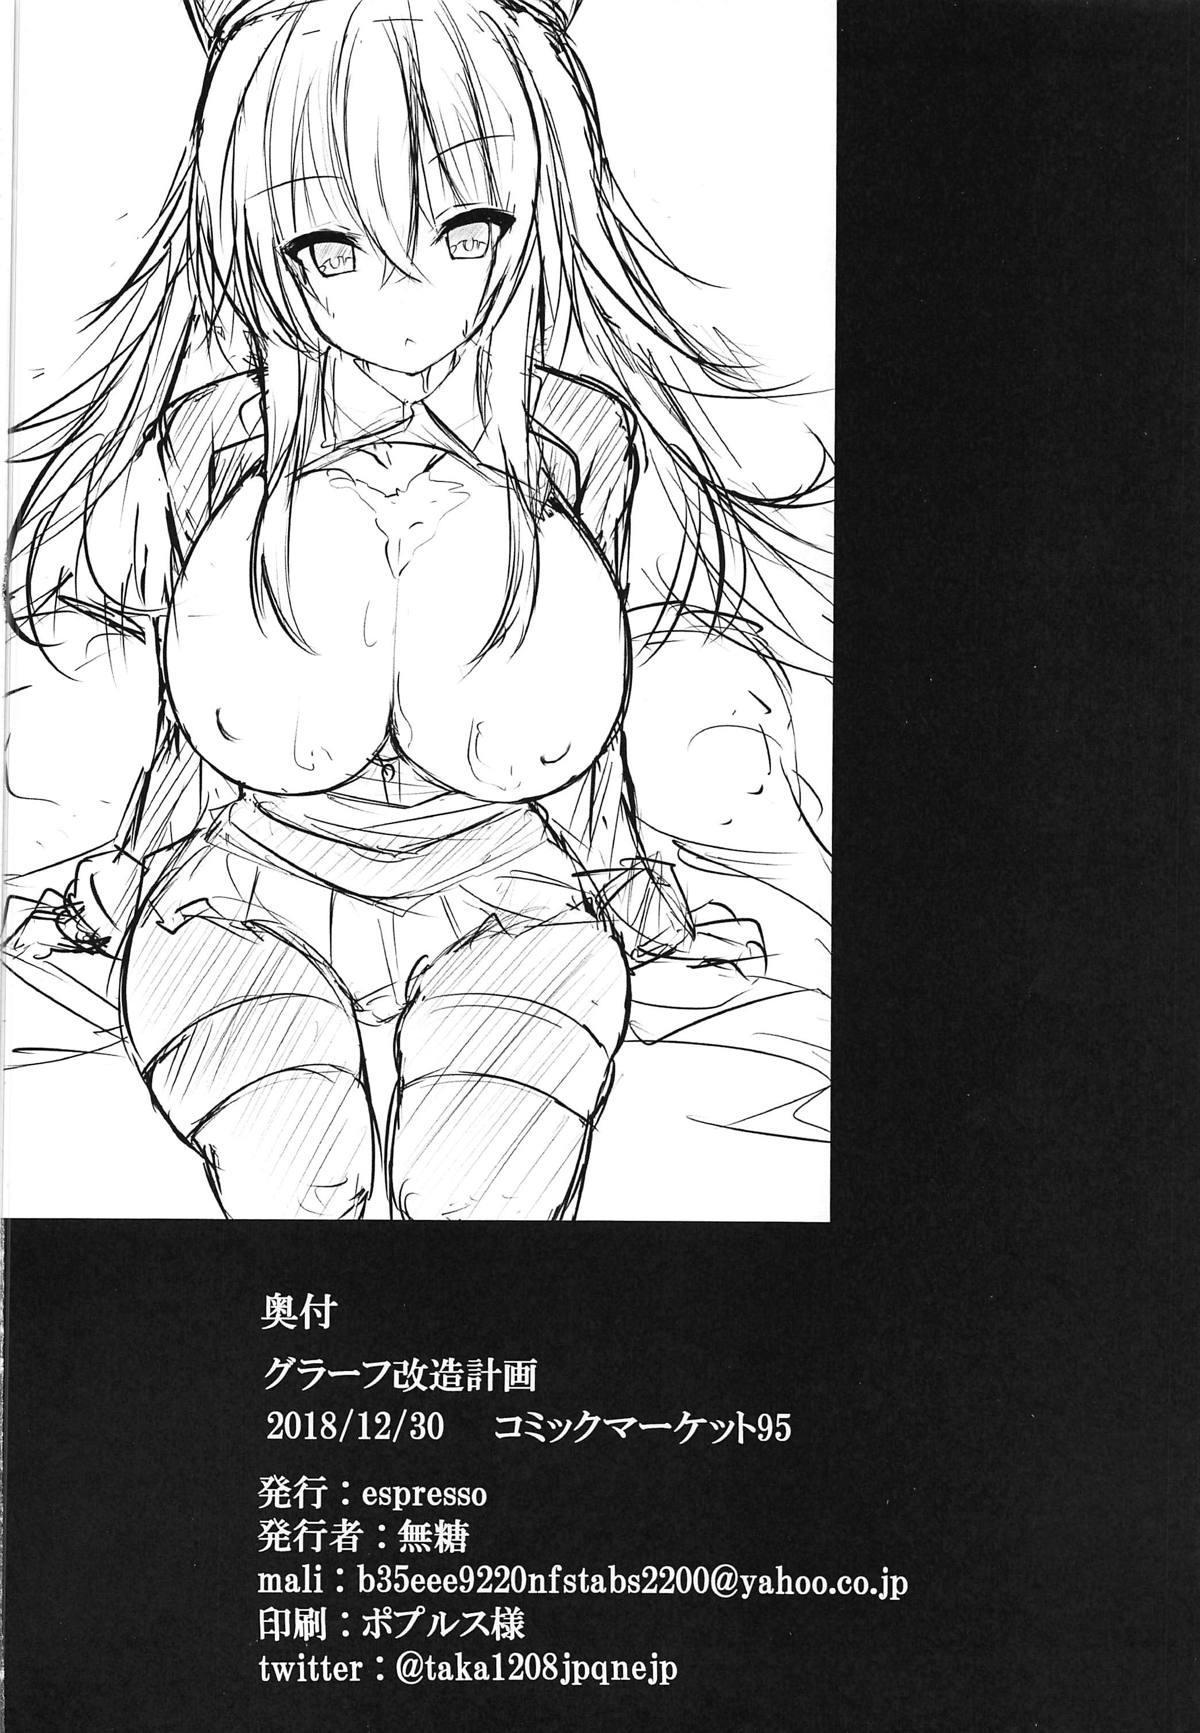 Graf Kaizou Keikaku | Graf Retrofit Plan 12